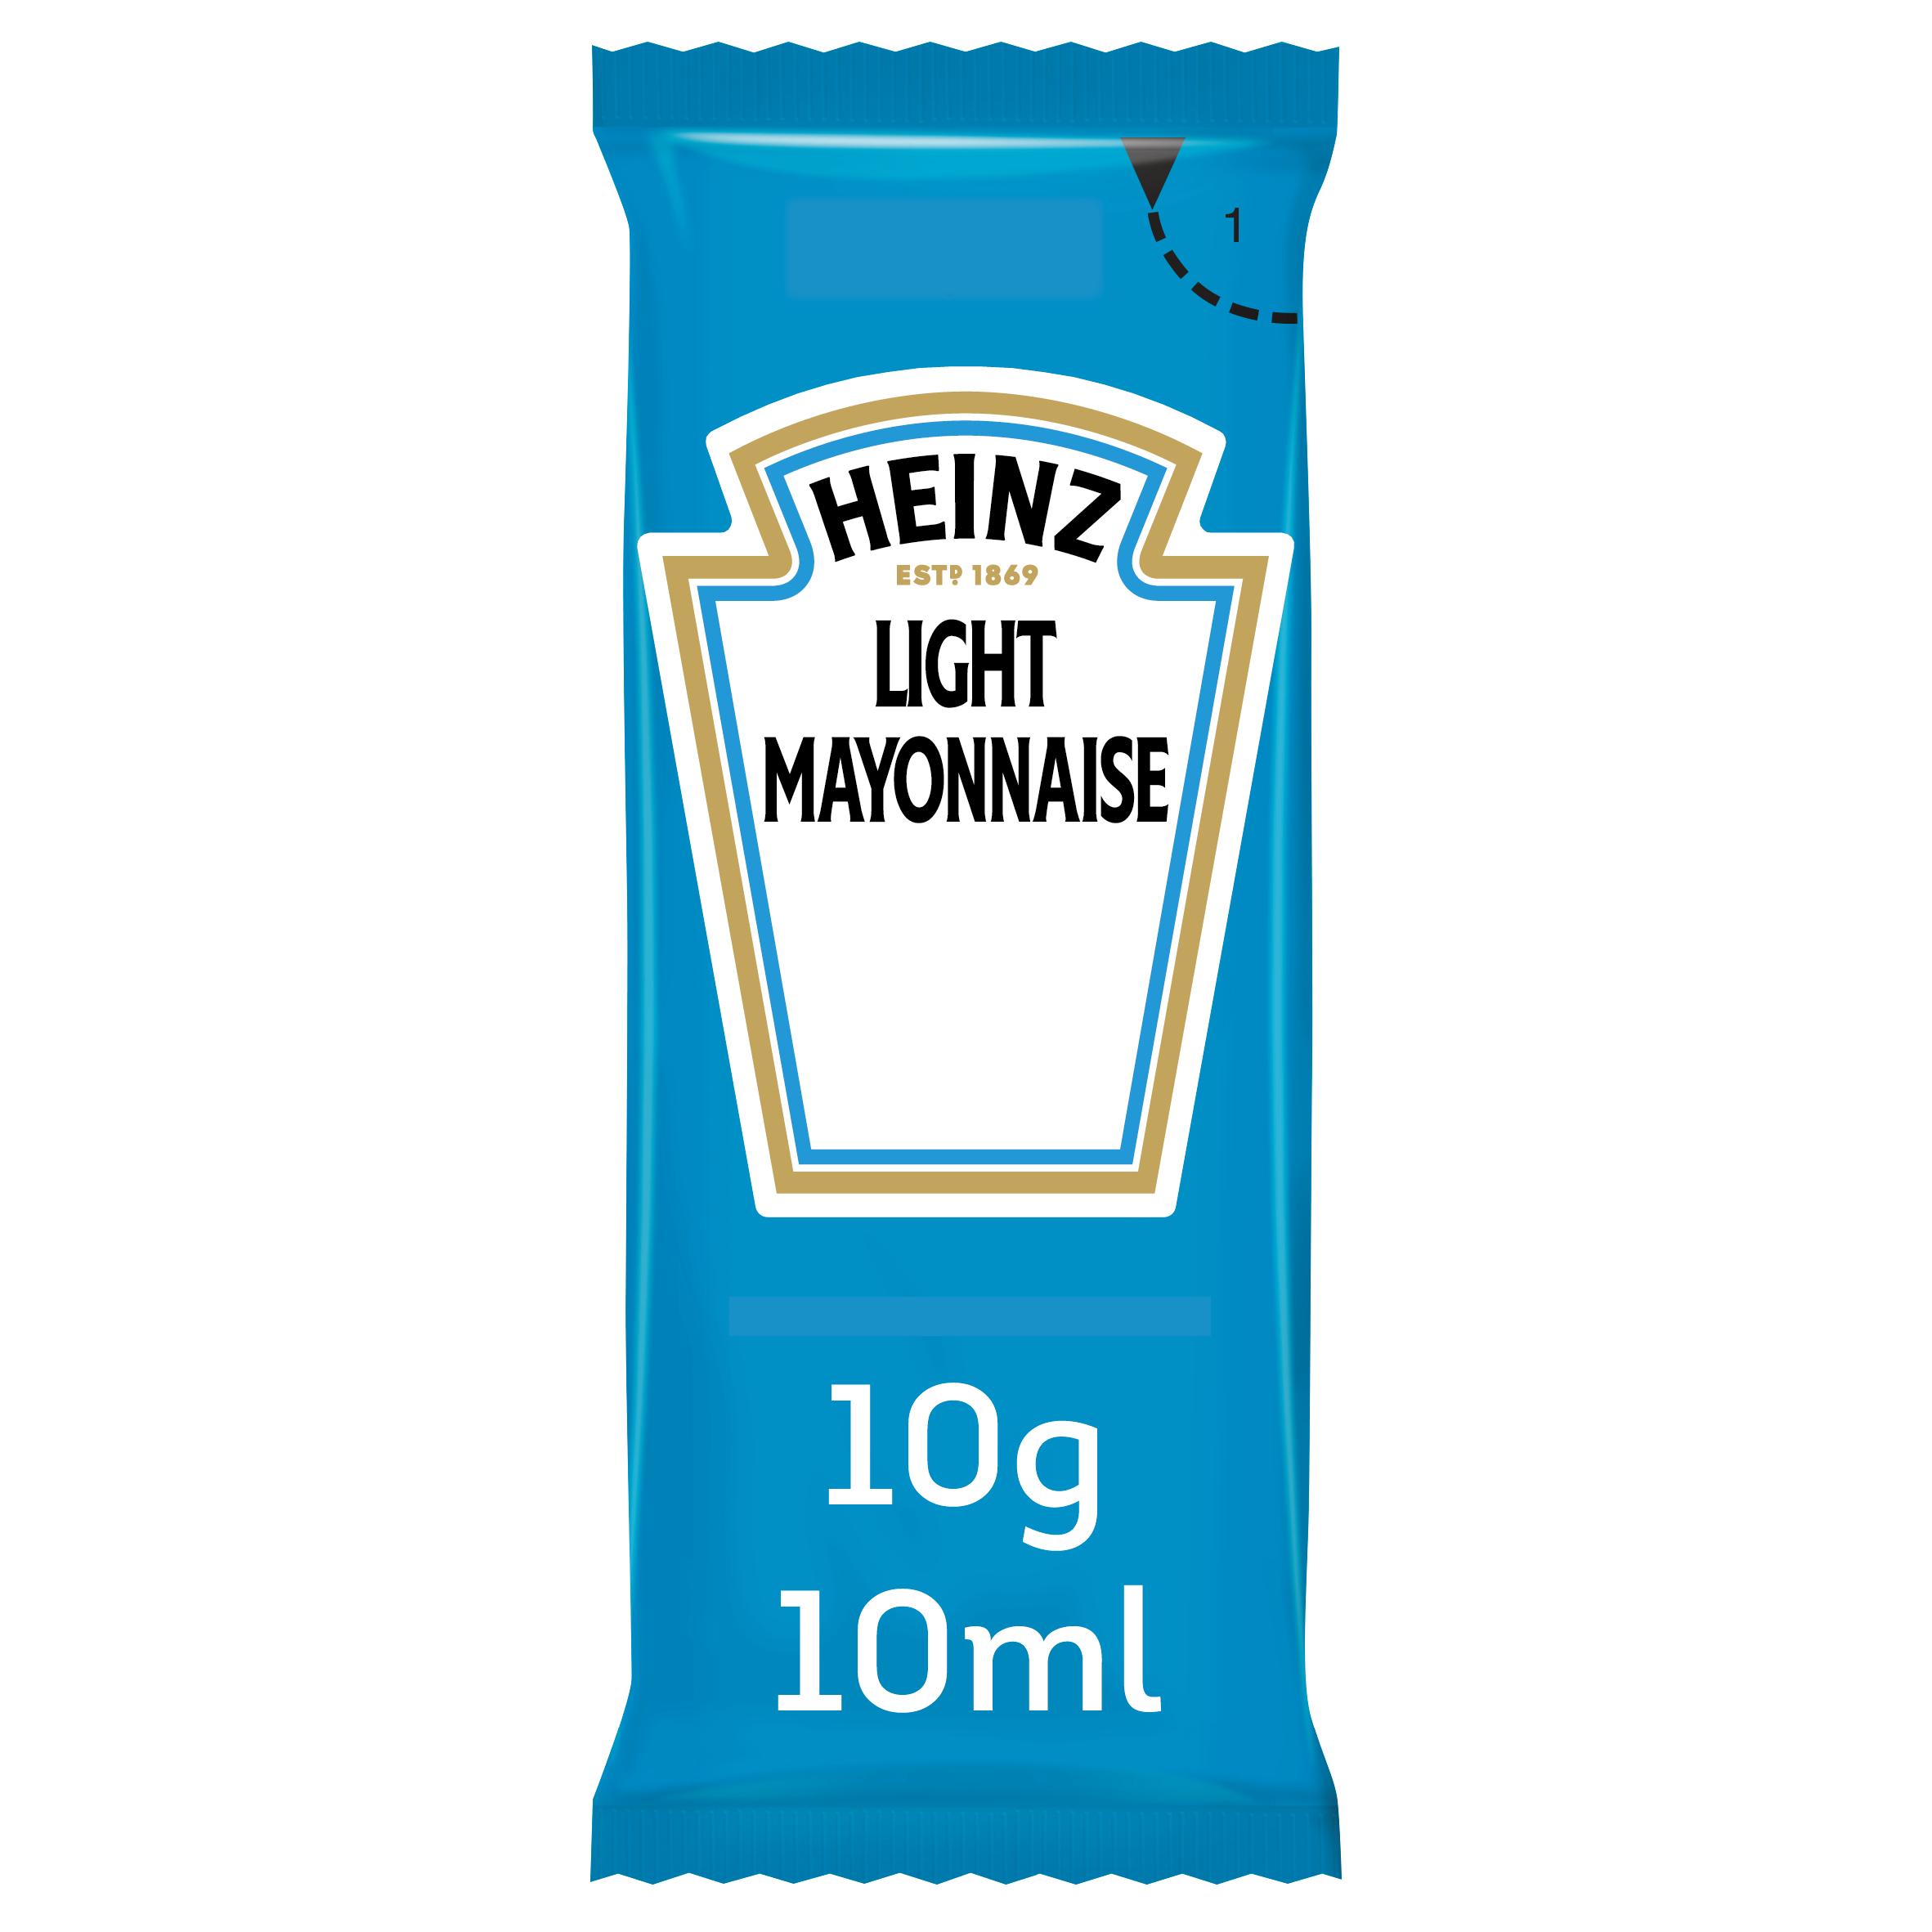 Heinz Mayonesa Light 10ml image